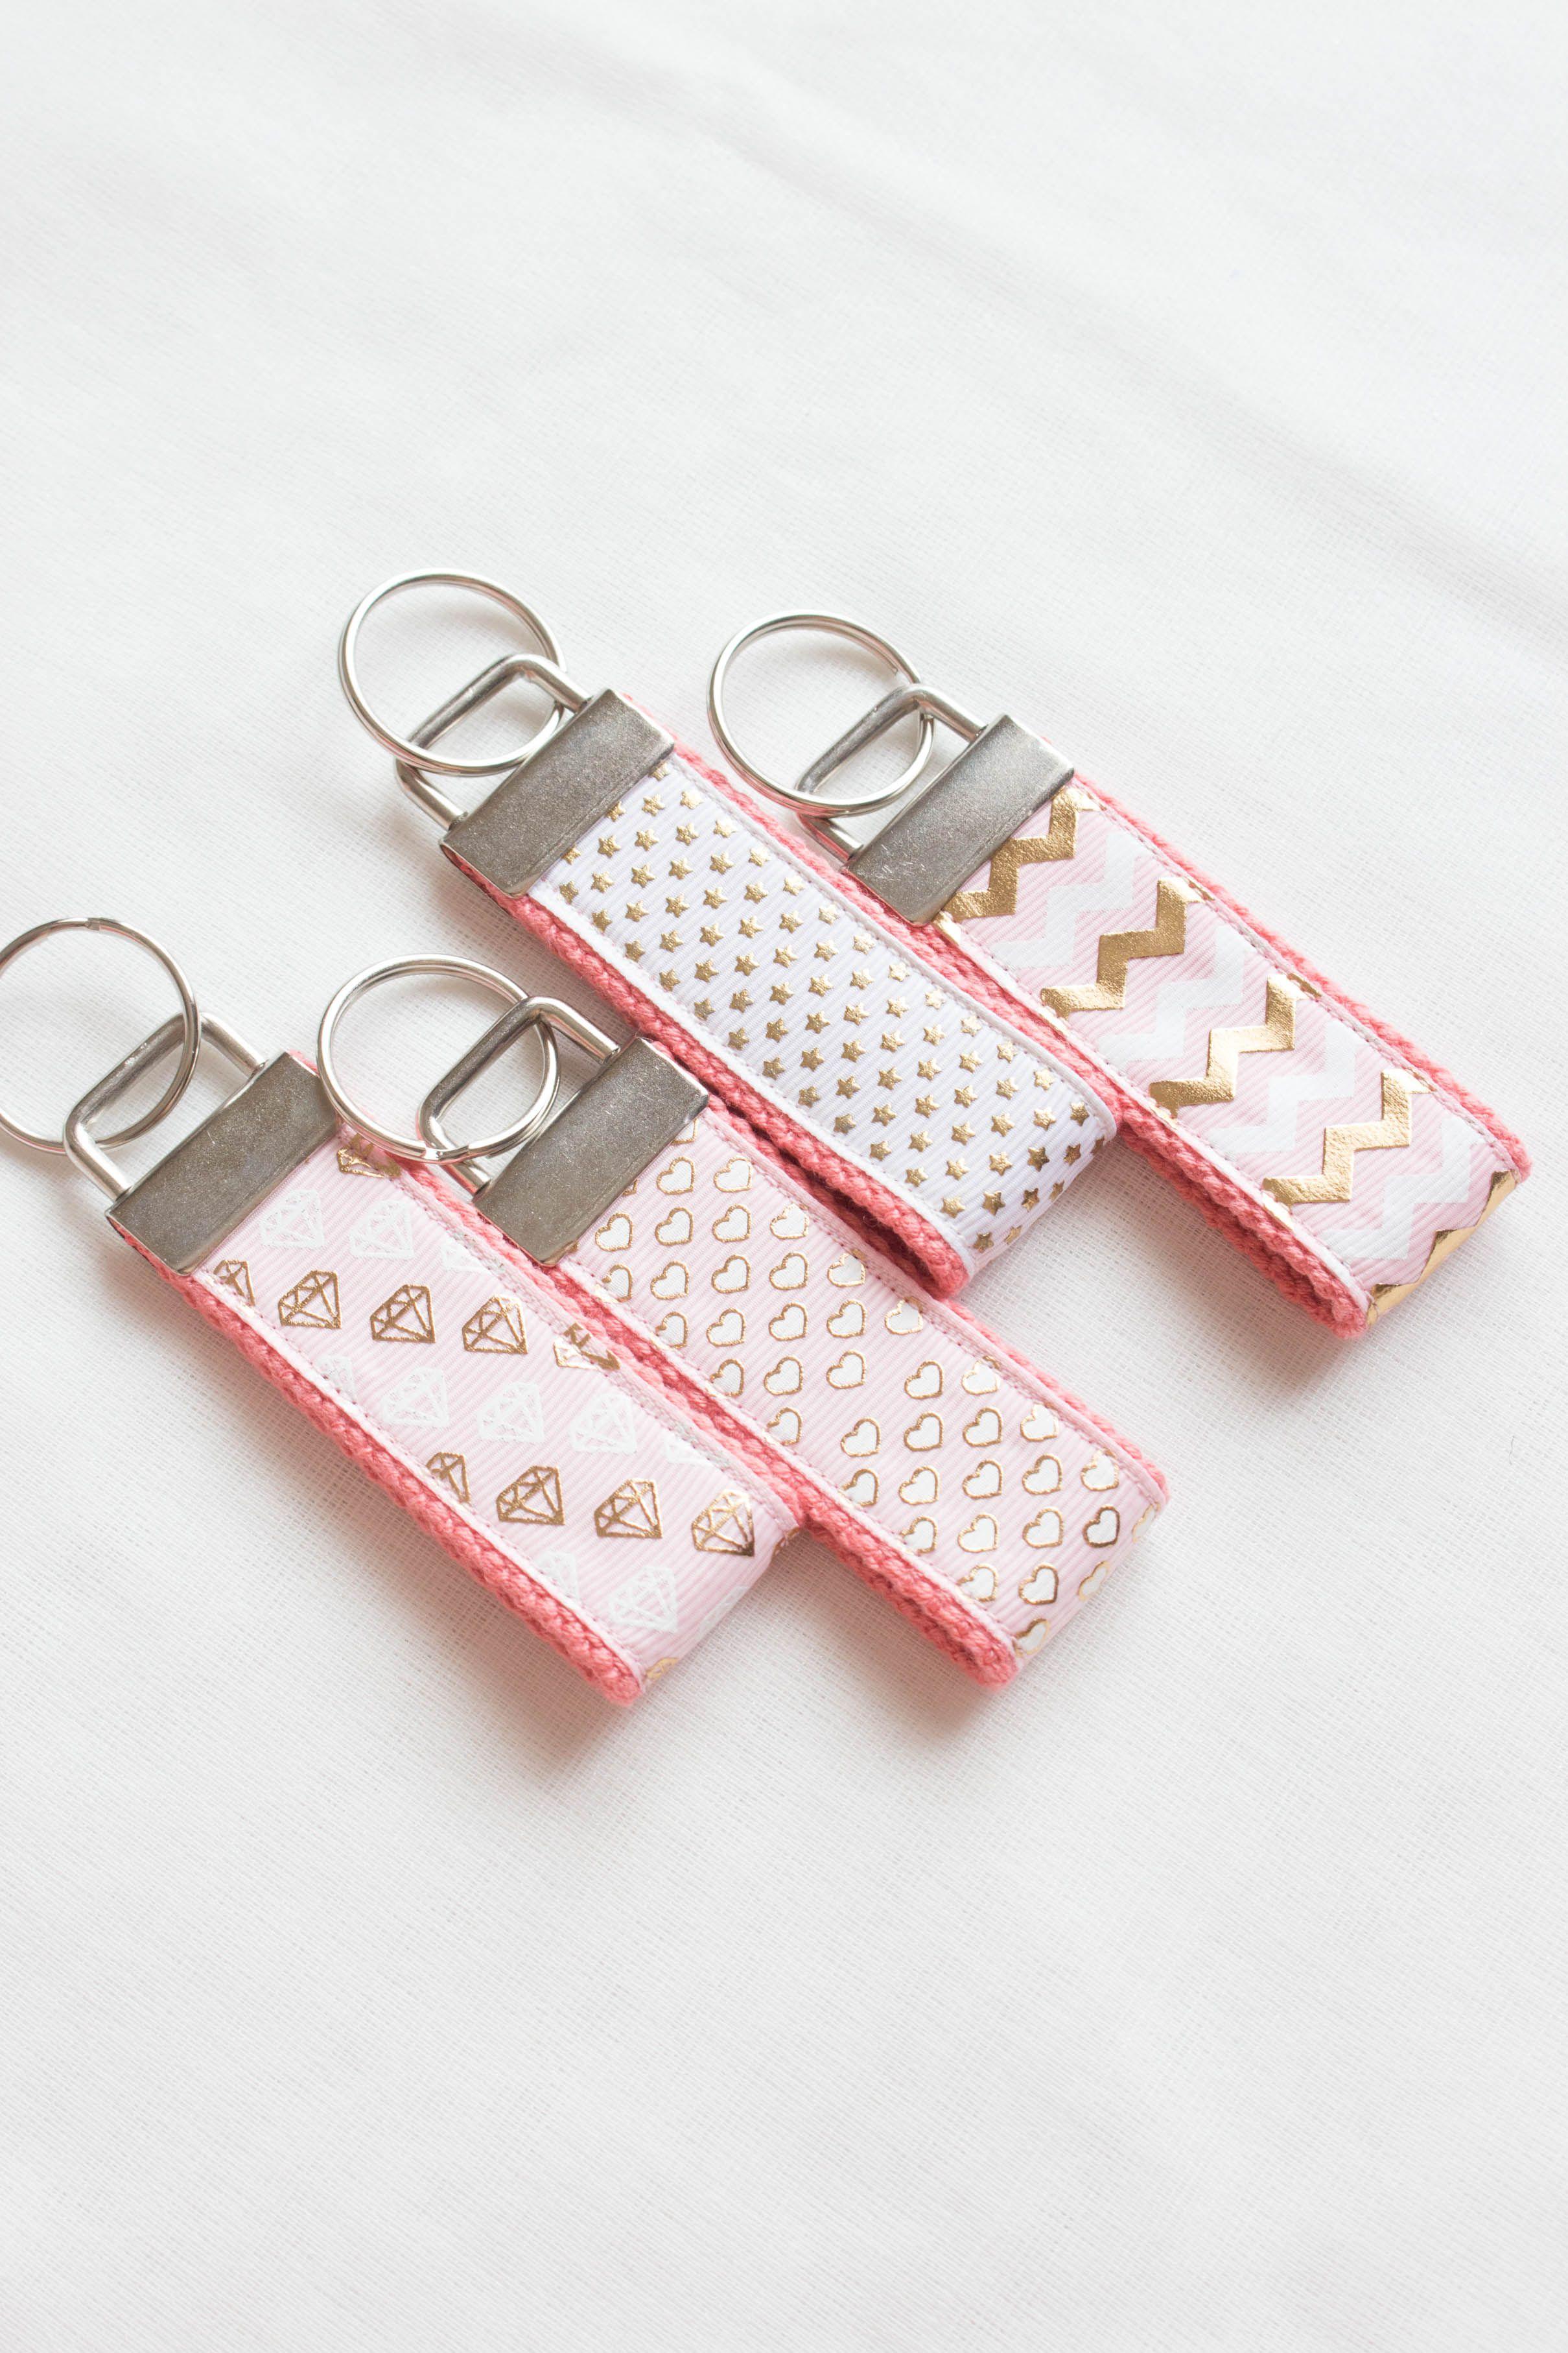 unique keychain accessory handmade kawaii